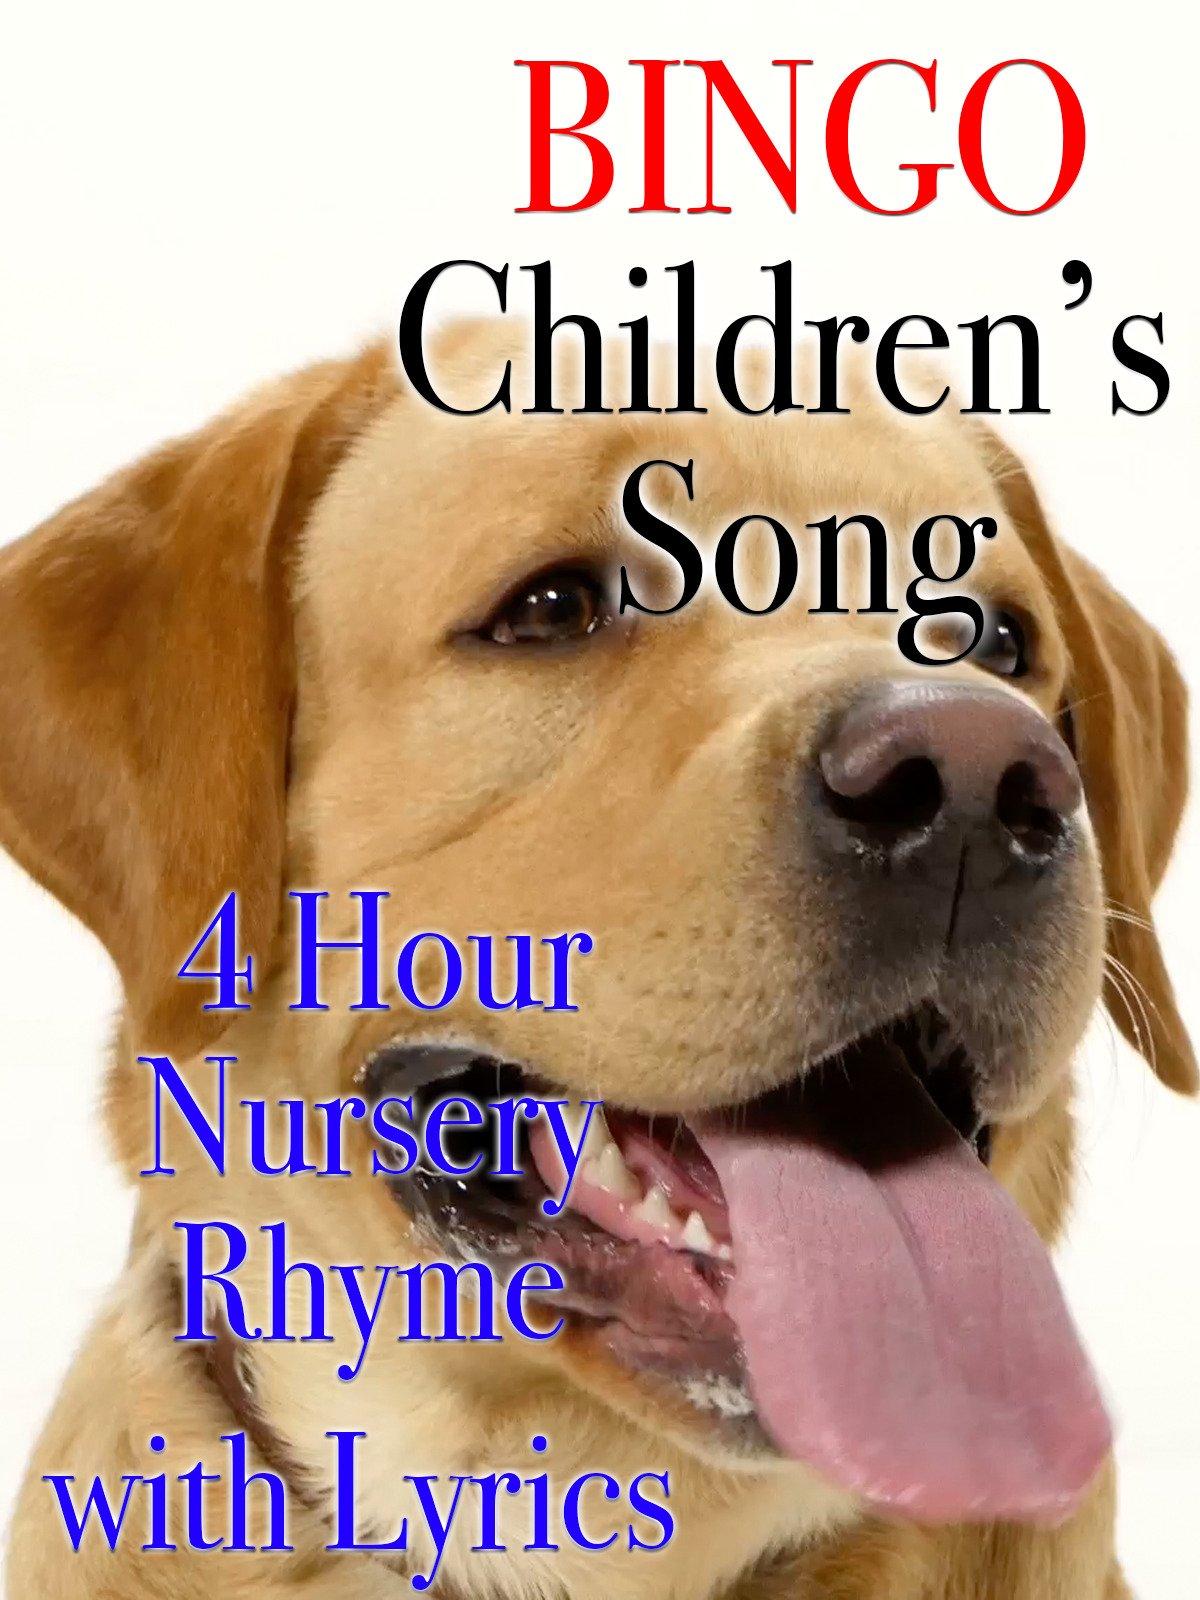 Bingo Children's Song 4 Hour Nursery Rhyme with Lyrics on Amazon Prime Video UK